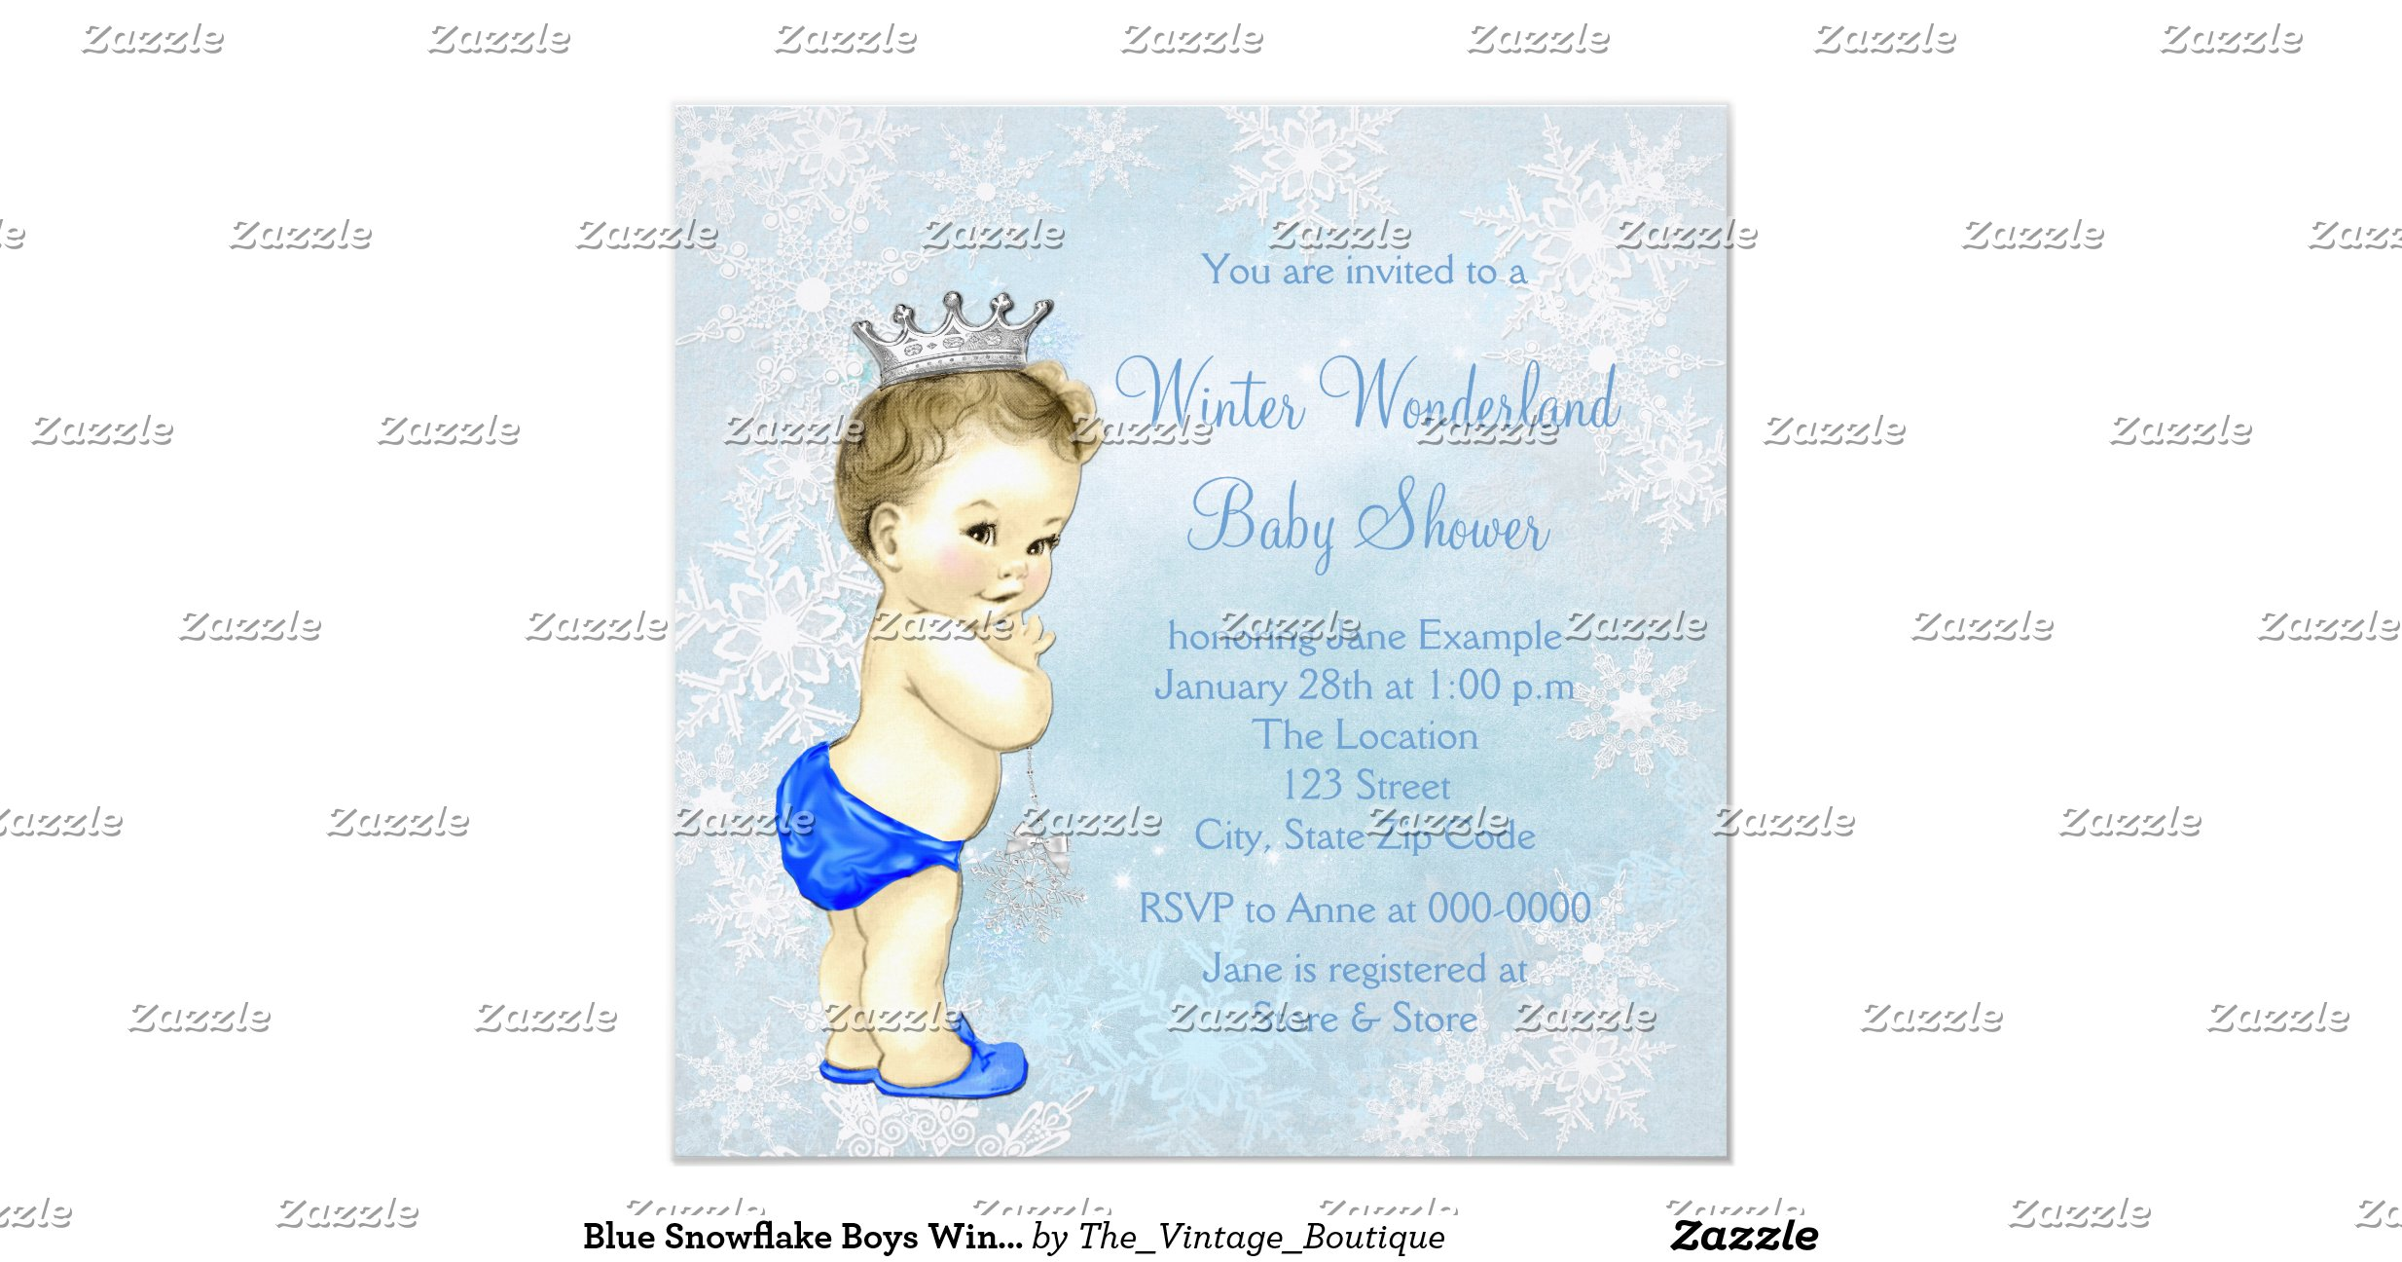 blue snowflake boys winter wonderland baby shower invitation